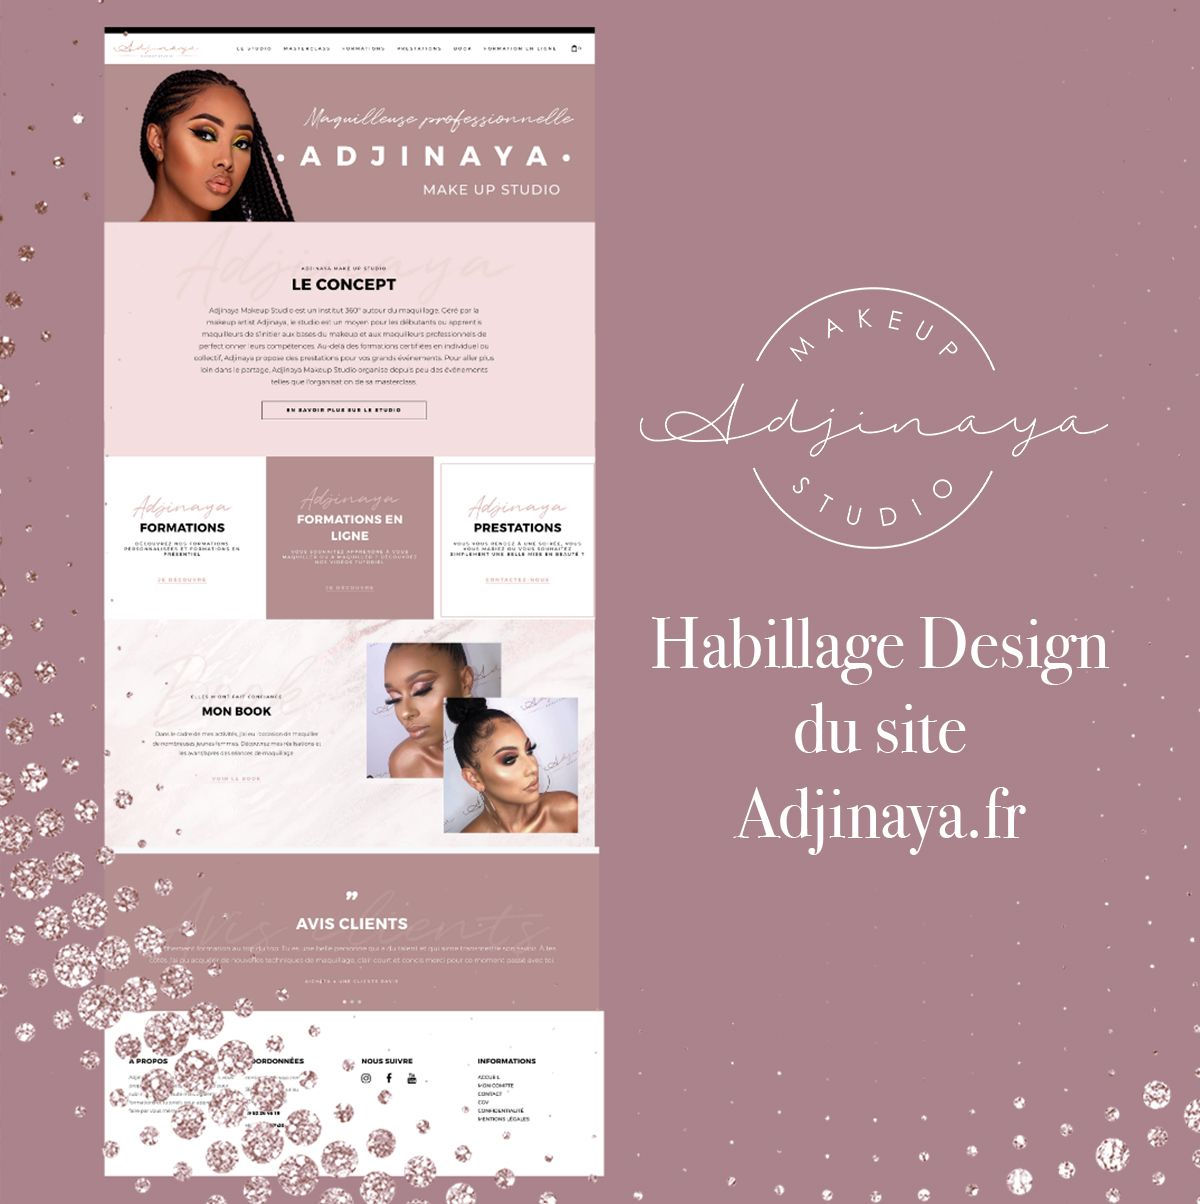 Webdesign Adjinaya Feminin Creation De Site Make Up Studio Webdesigner Freelance Site Internet